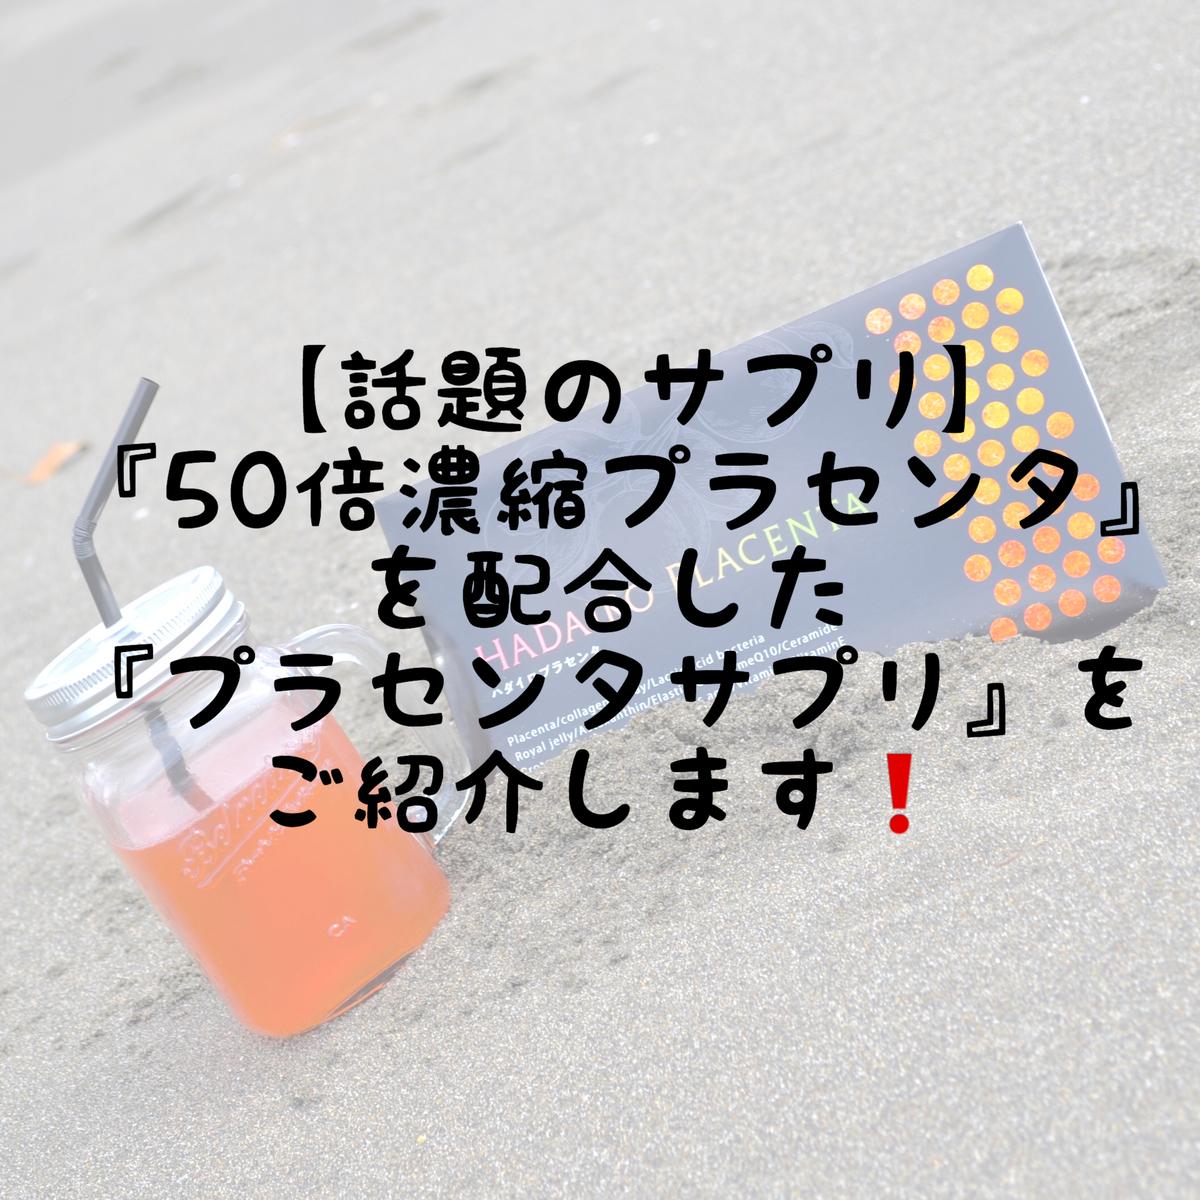 f:id:nokonoko_o:20200518182835j:plain